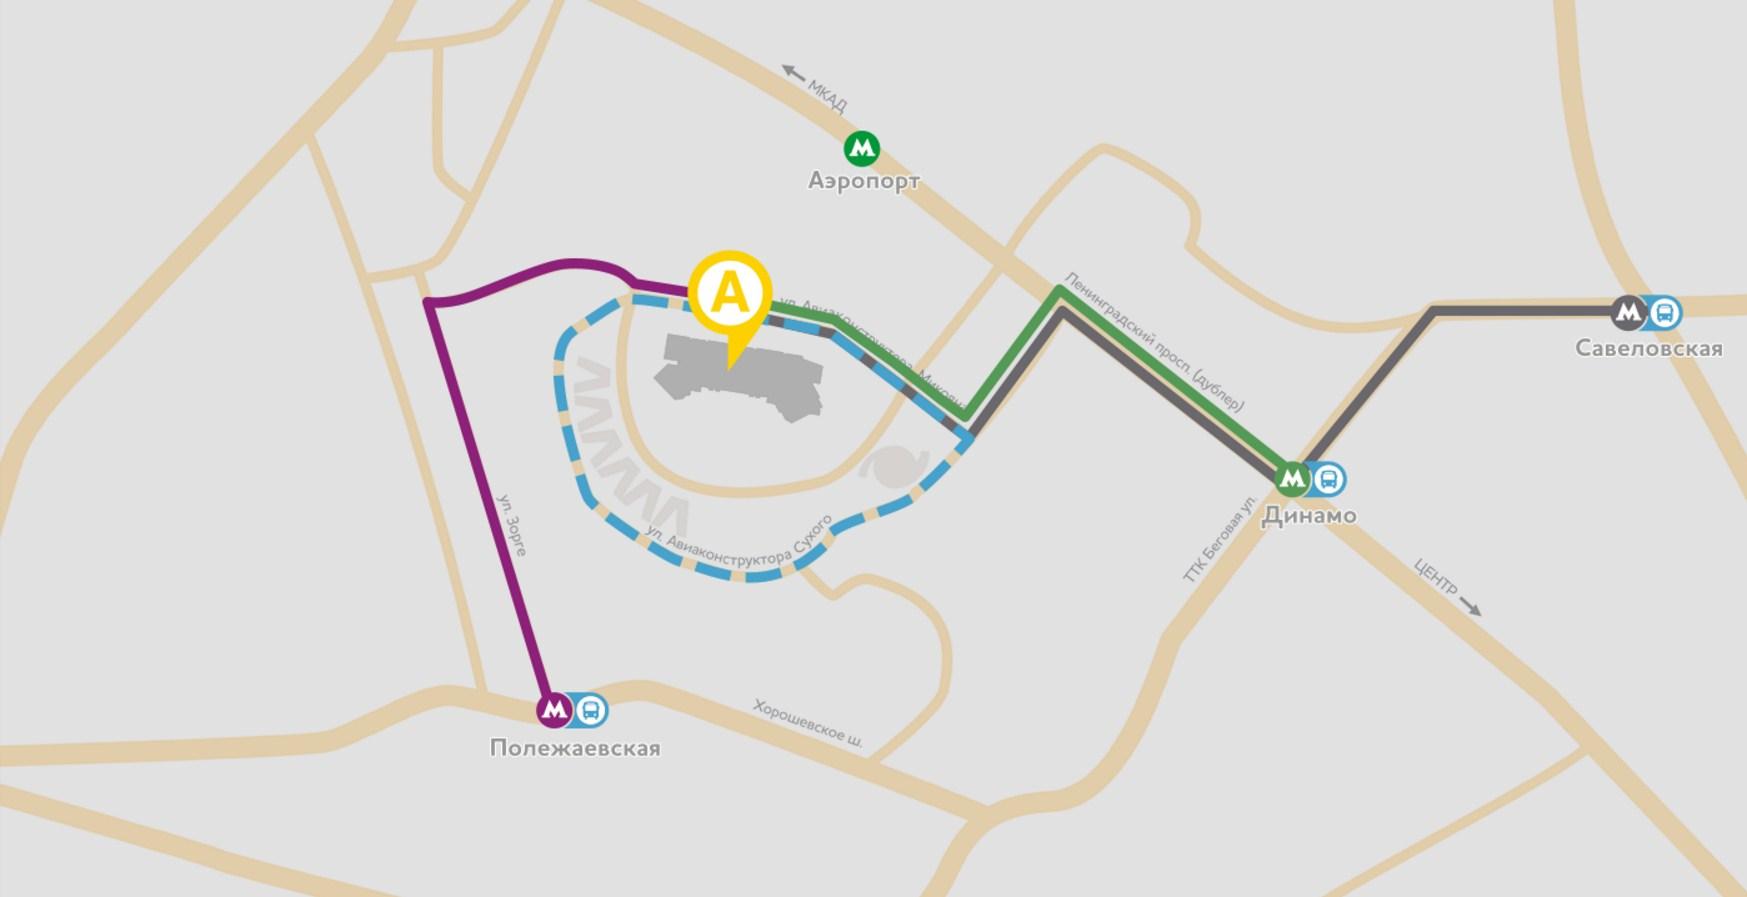 Как добраться от метро динамо до авиапарка